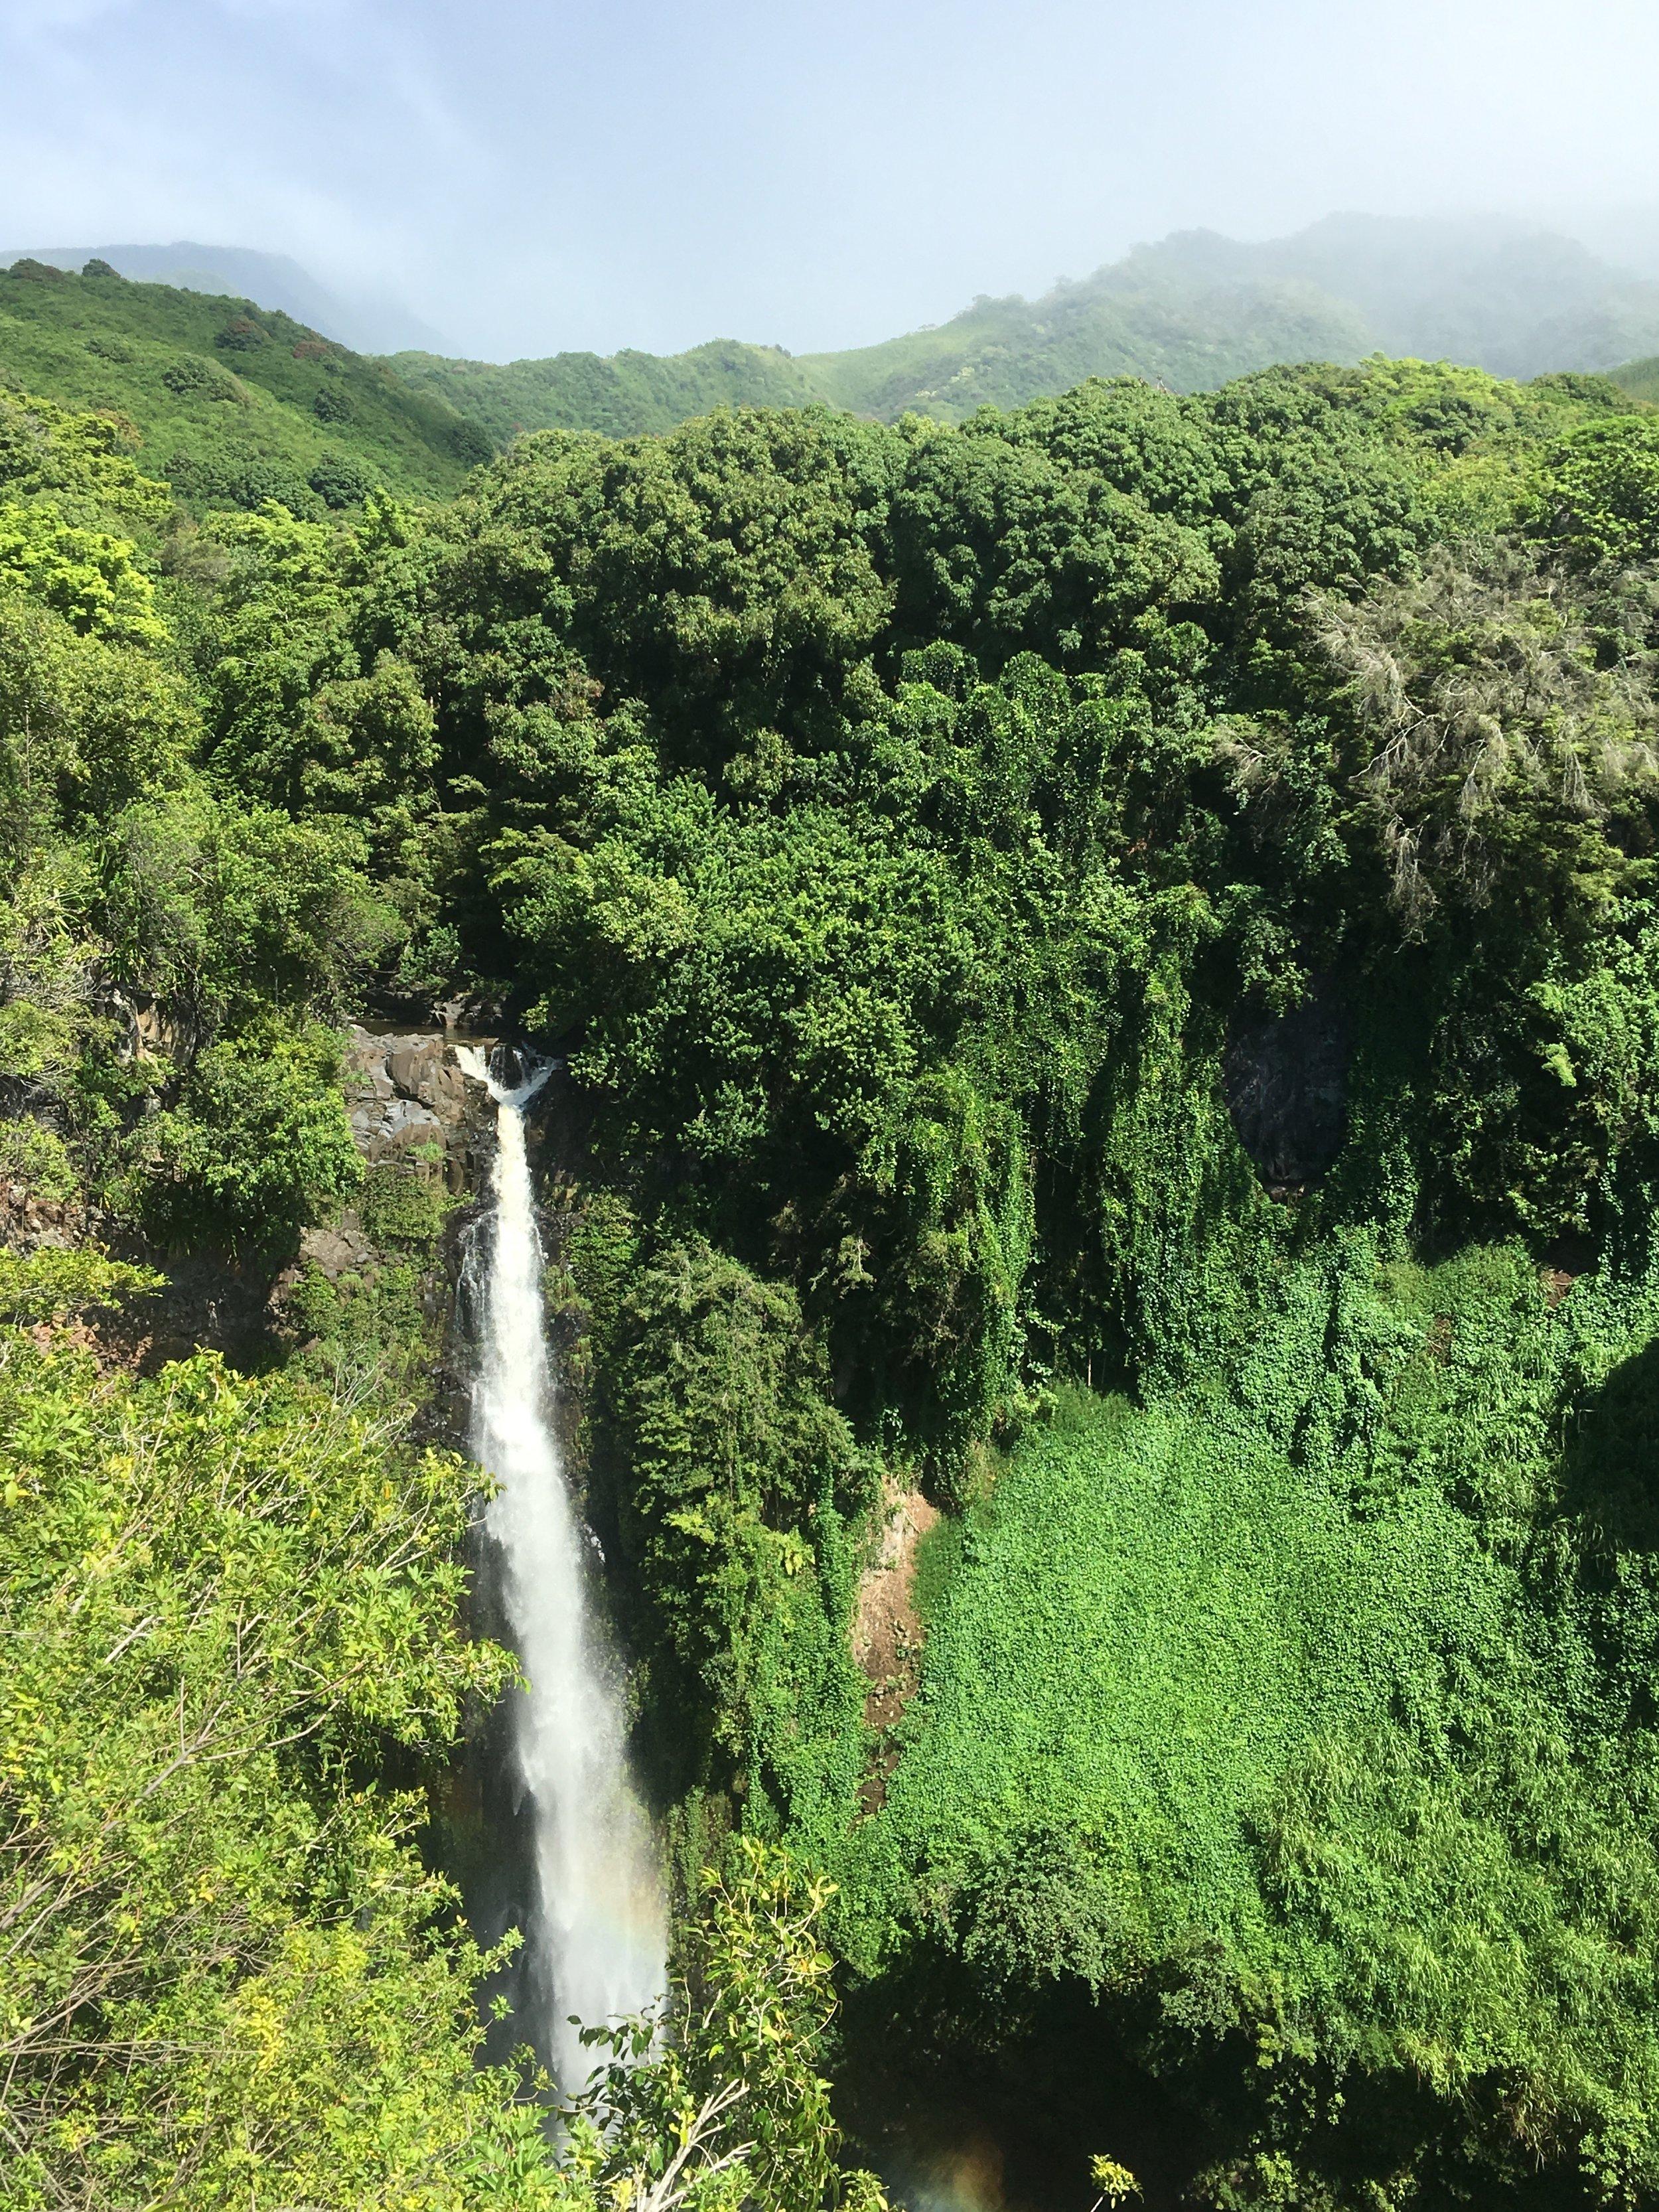 Blue_Soul_Maui_Private_Tour_Hana_Waterfall_13.jpg